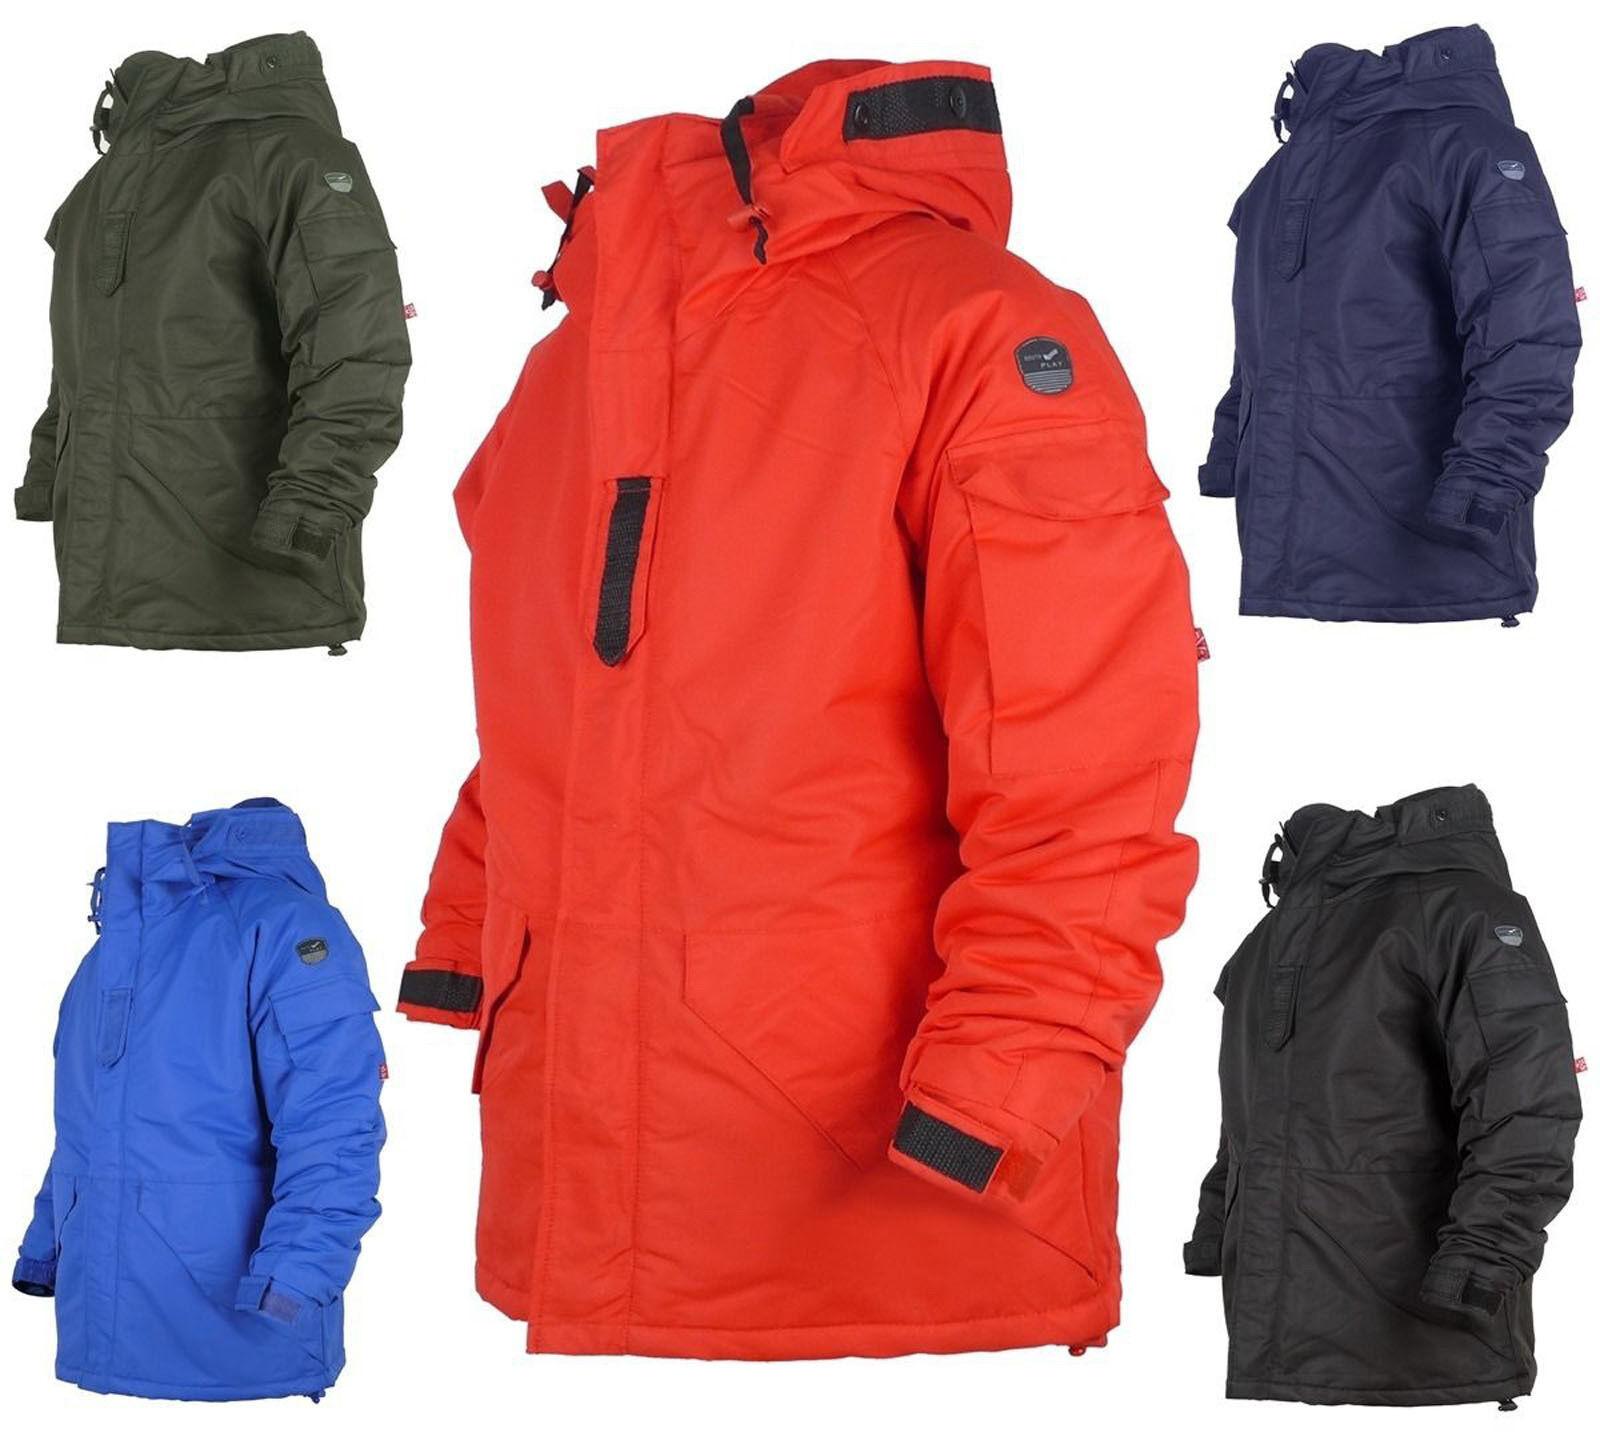 Southplay Mens Winter Premium Waterproof  Military Ski-Snowboard Jacket_BJ104